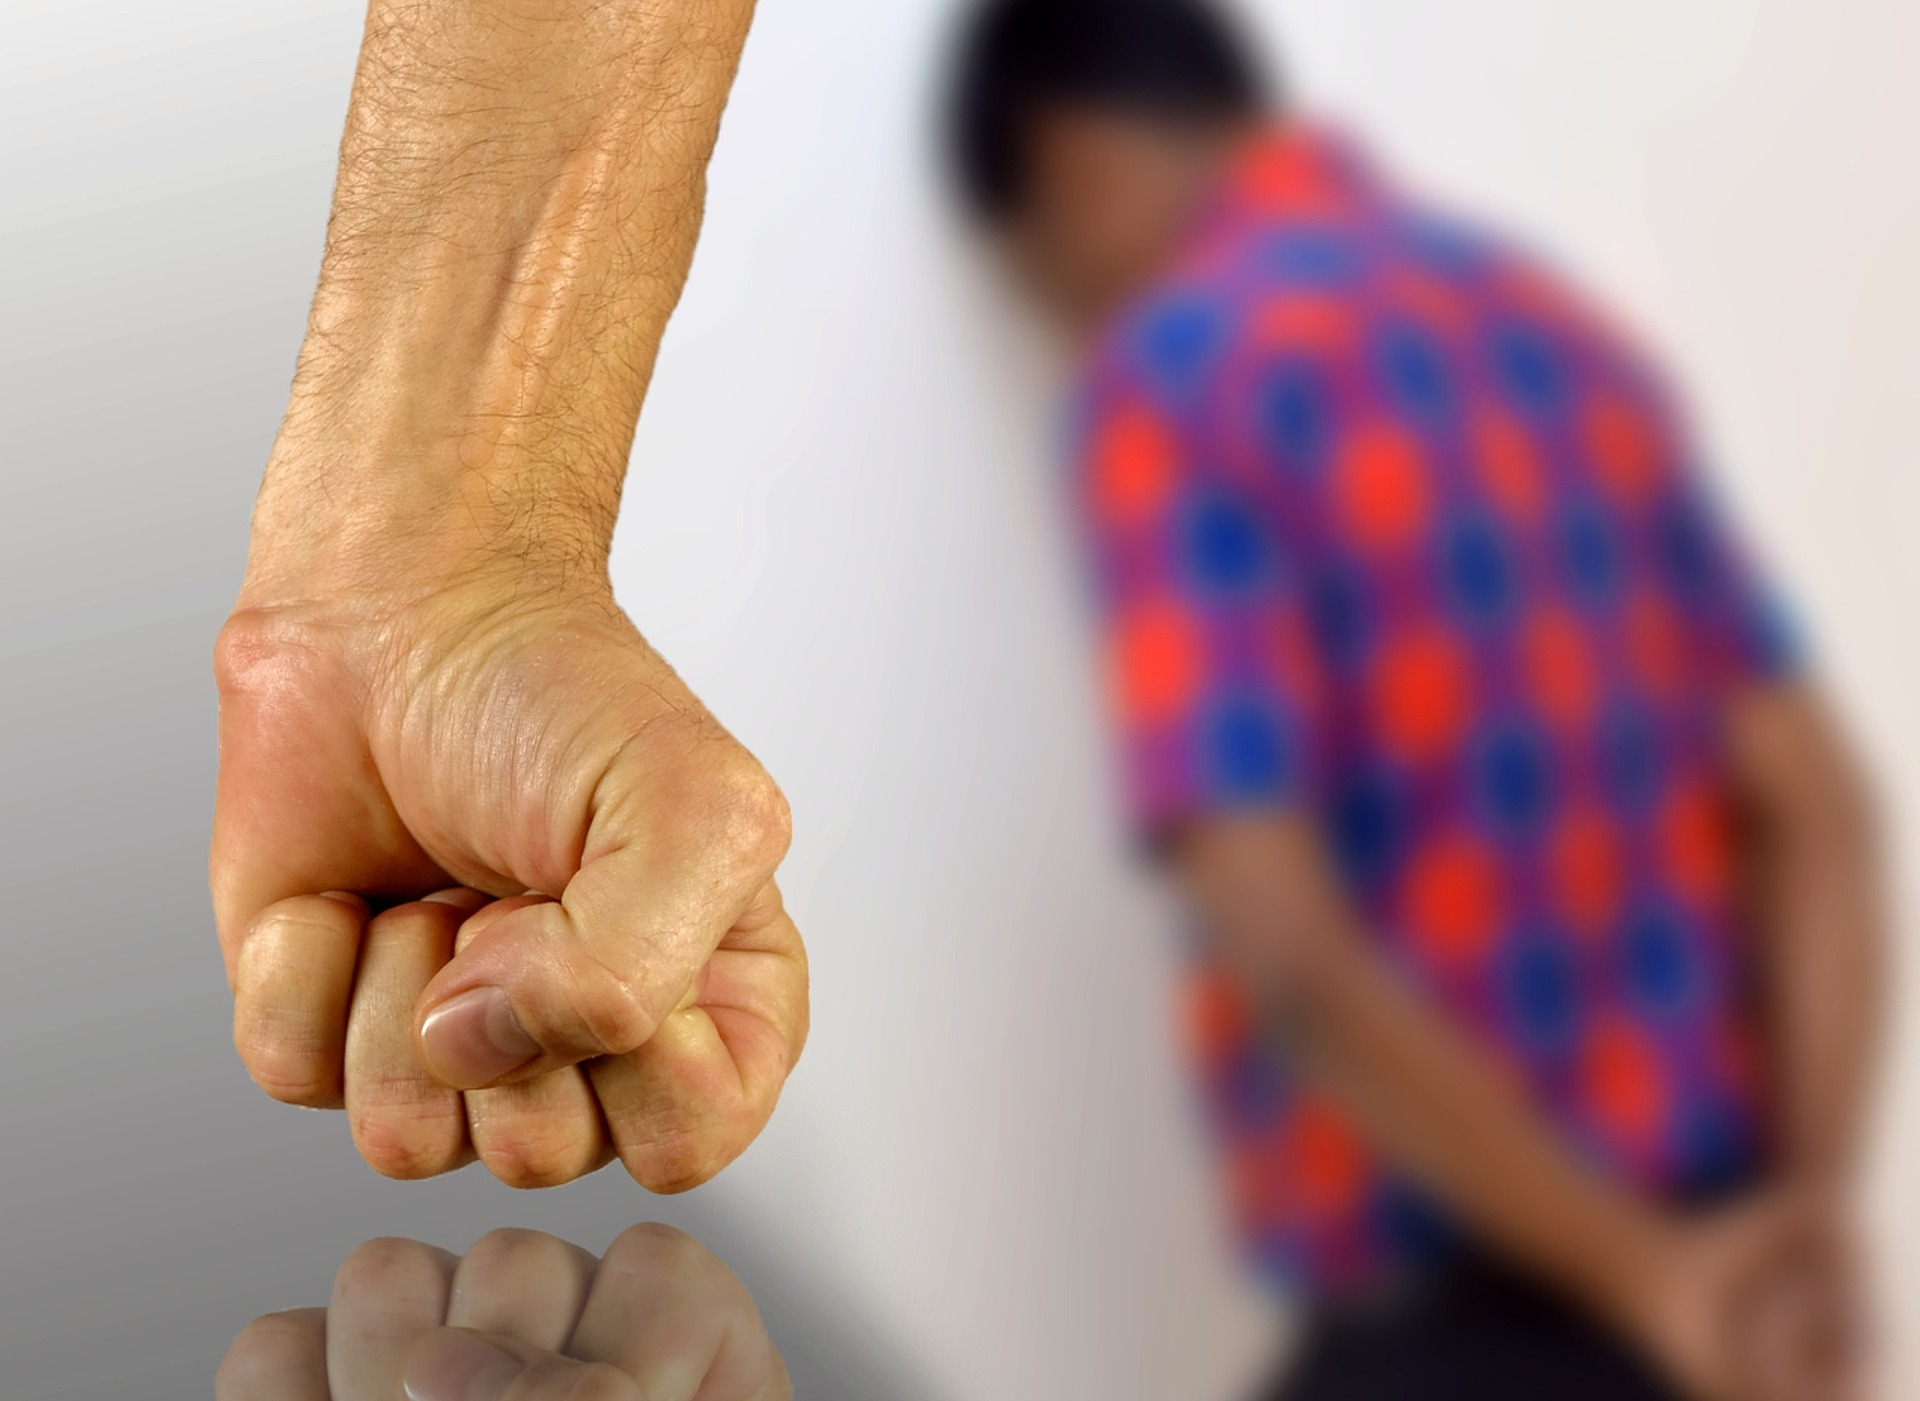 Children Abuse Violence Erőszak